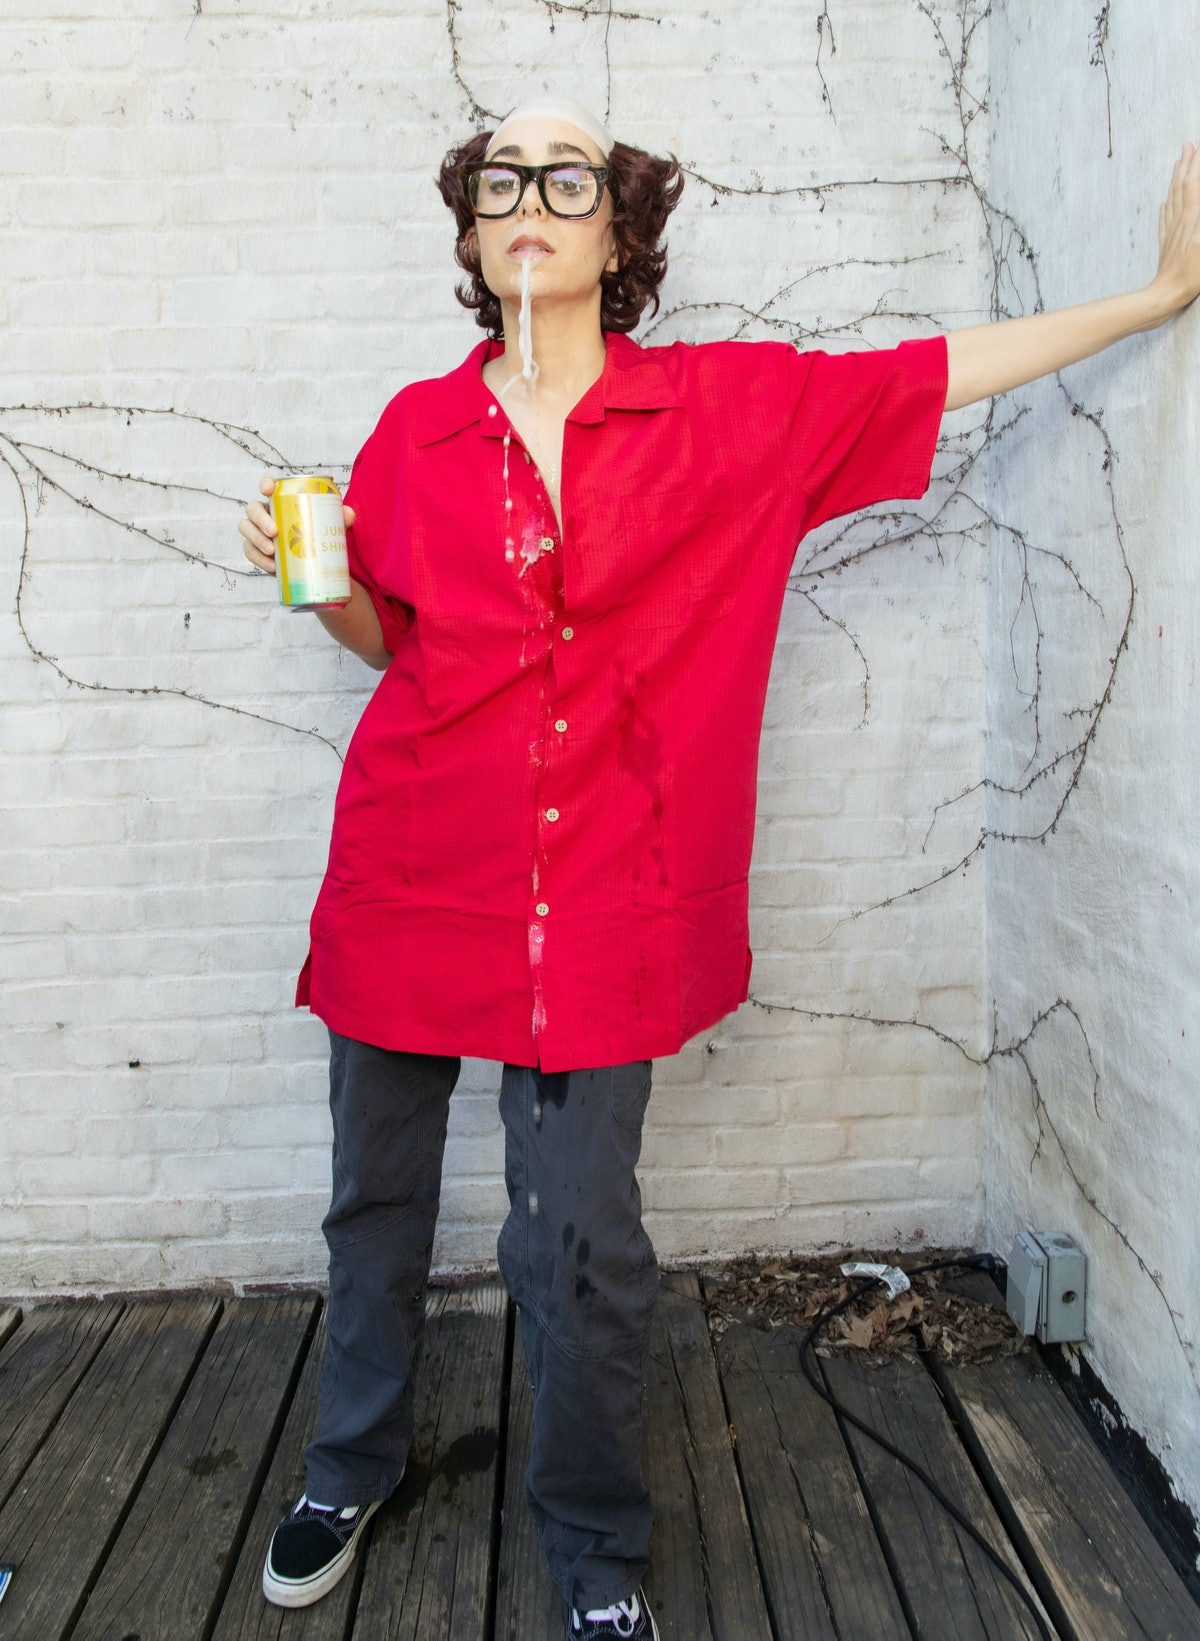 Cristin Milioti as Frank Reynolds from 'It's Always Sunny in Philadelphia'